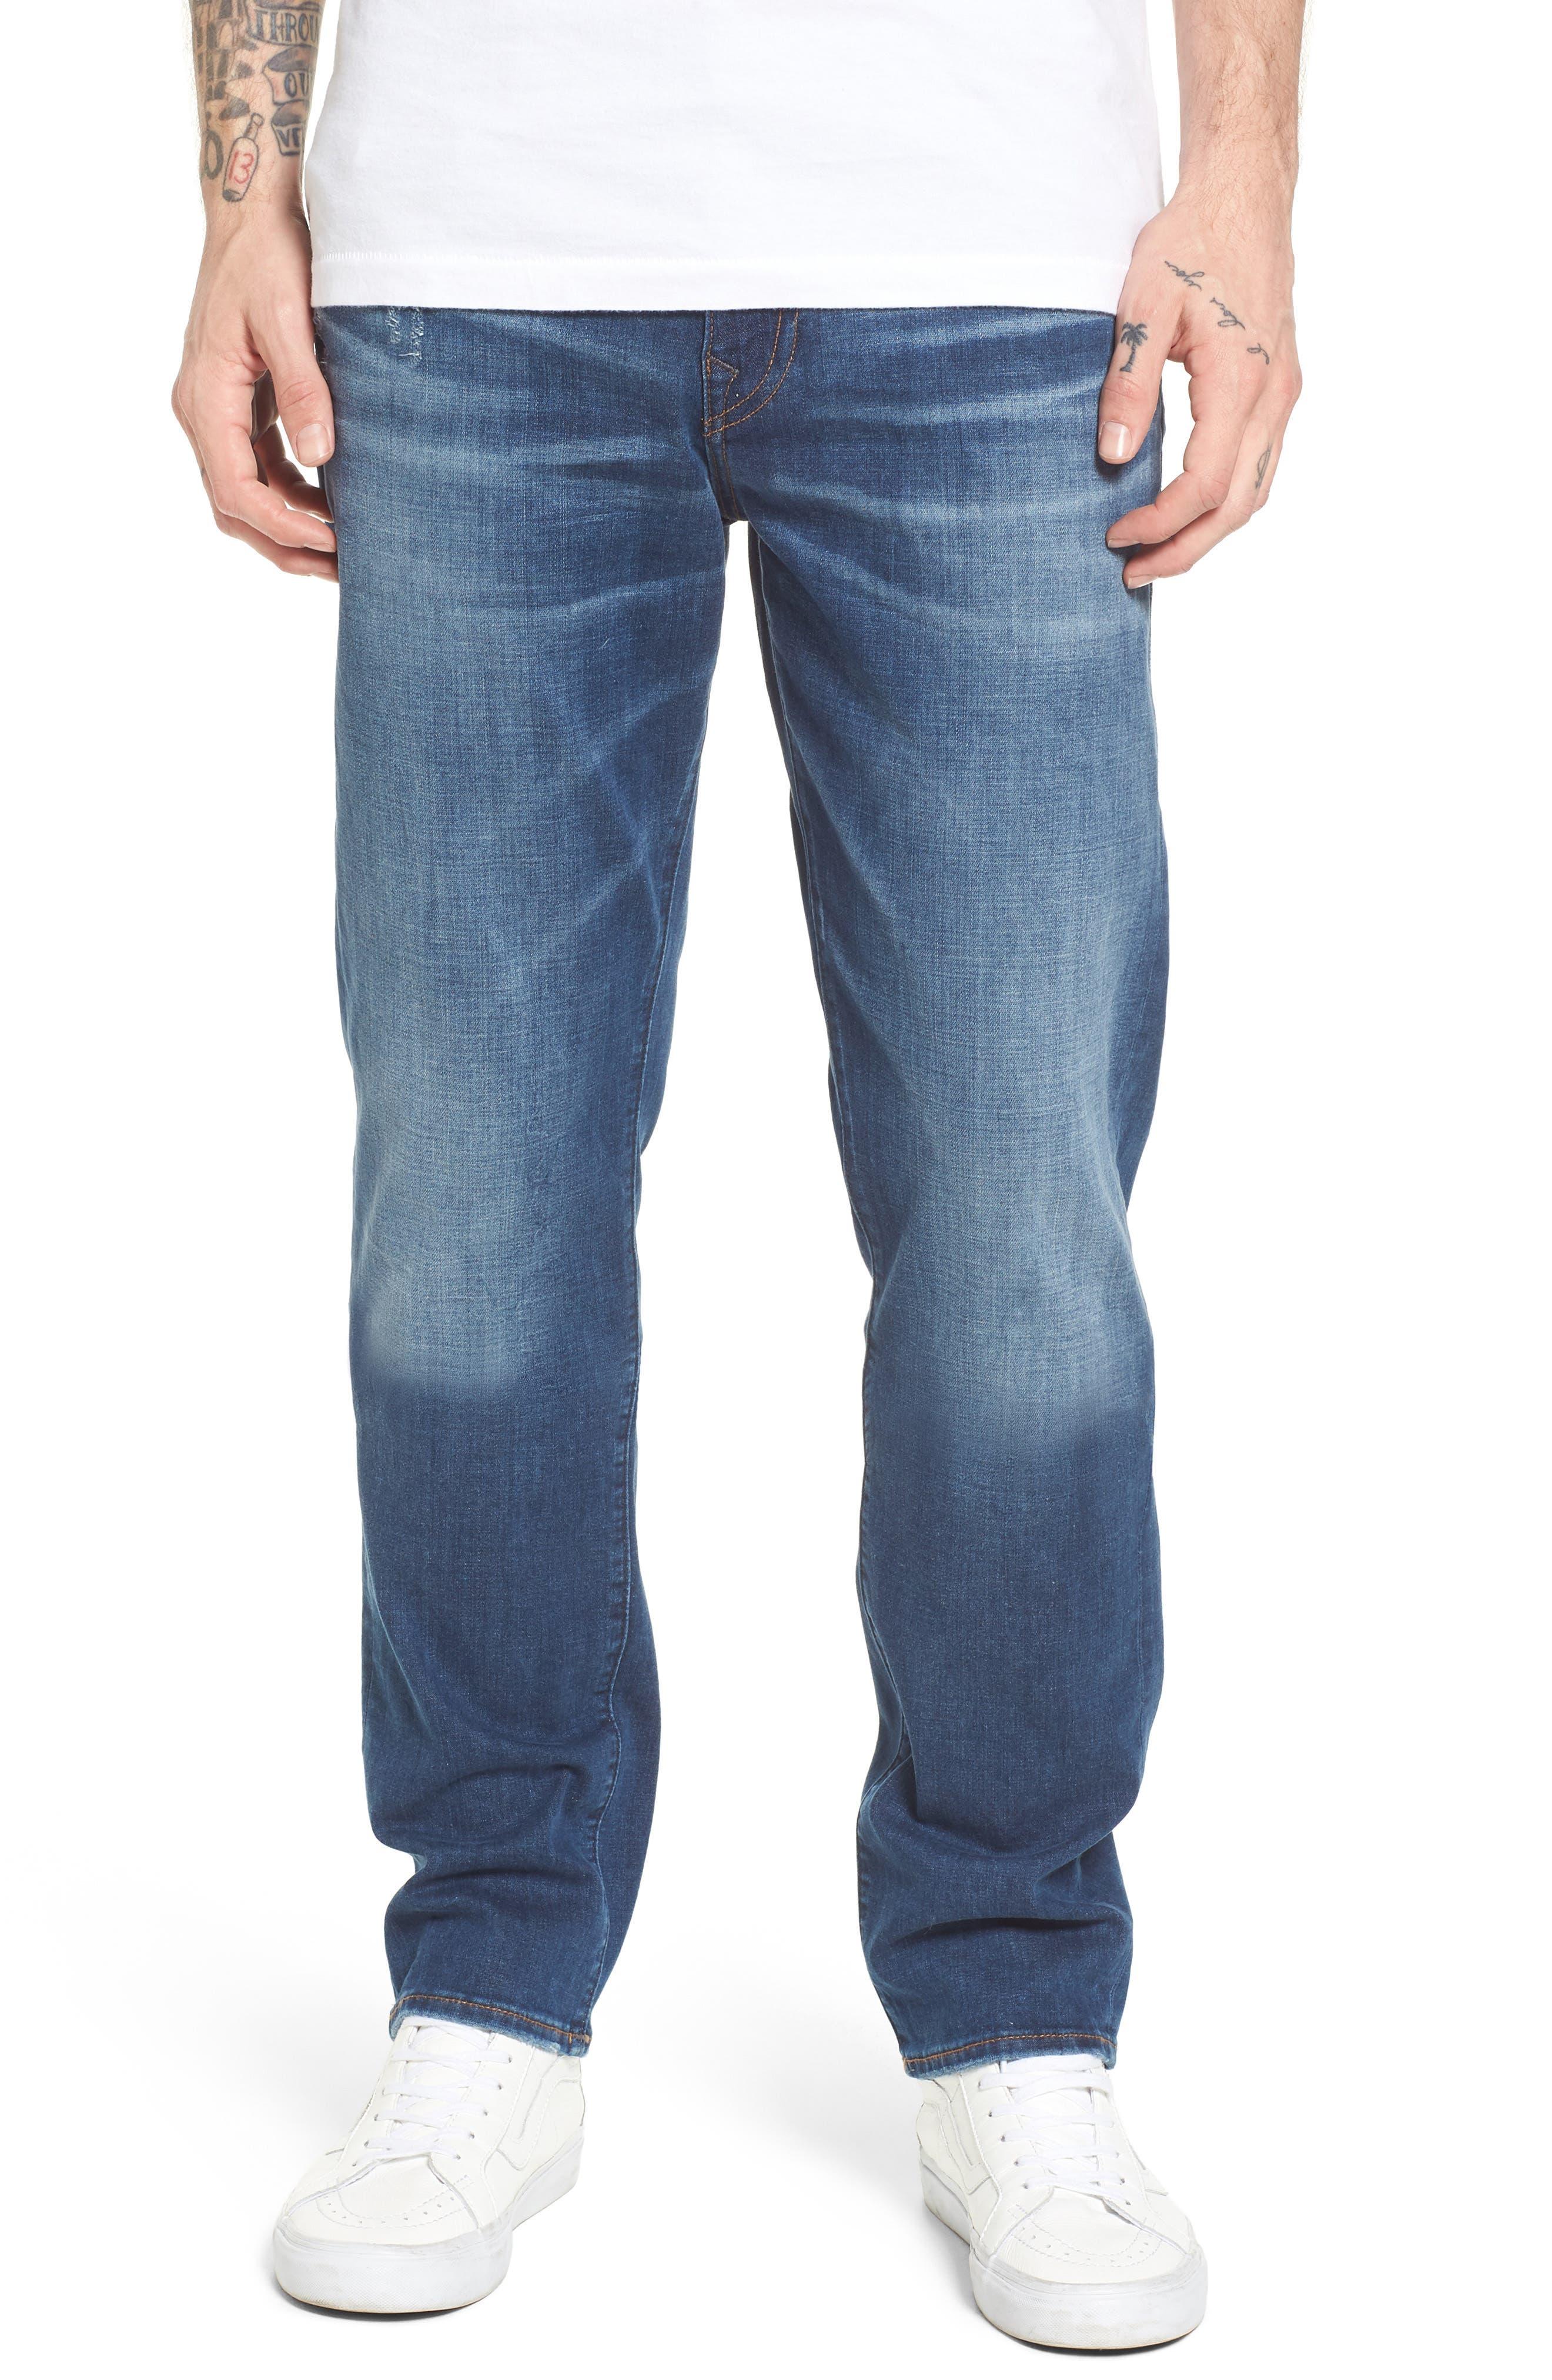 Geno Straight Leg Jeans,                         Main,                         color, Street Vice